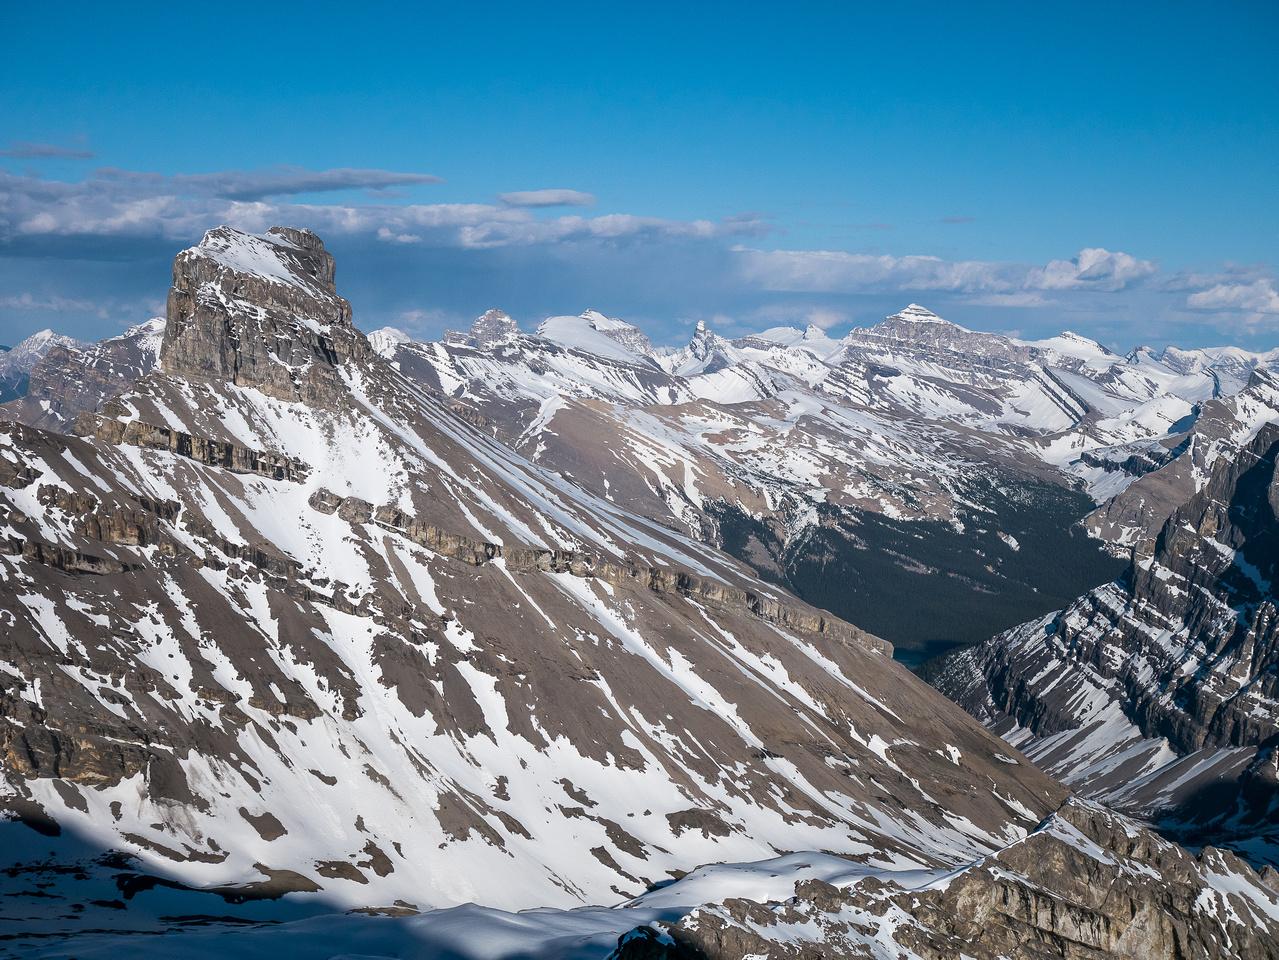 Tuft Peak looks fierce from this angle.